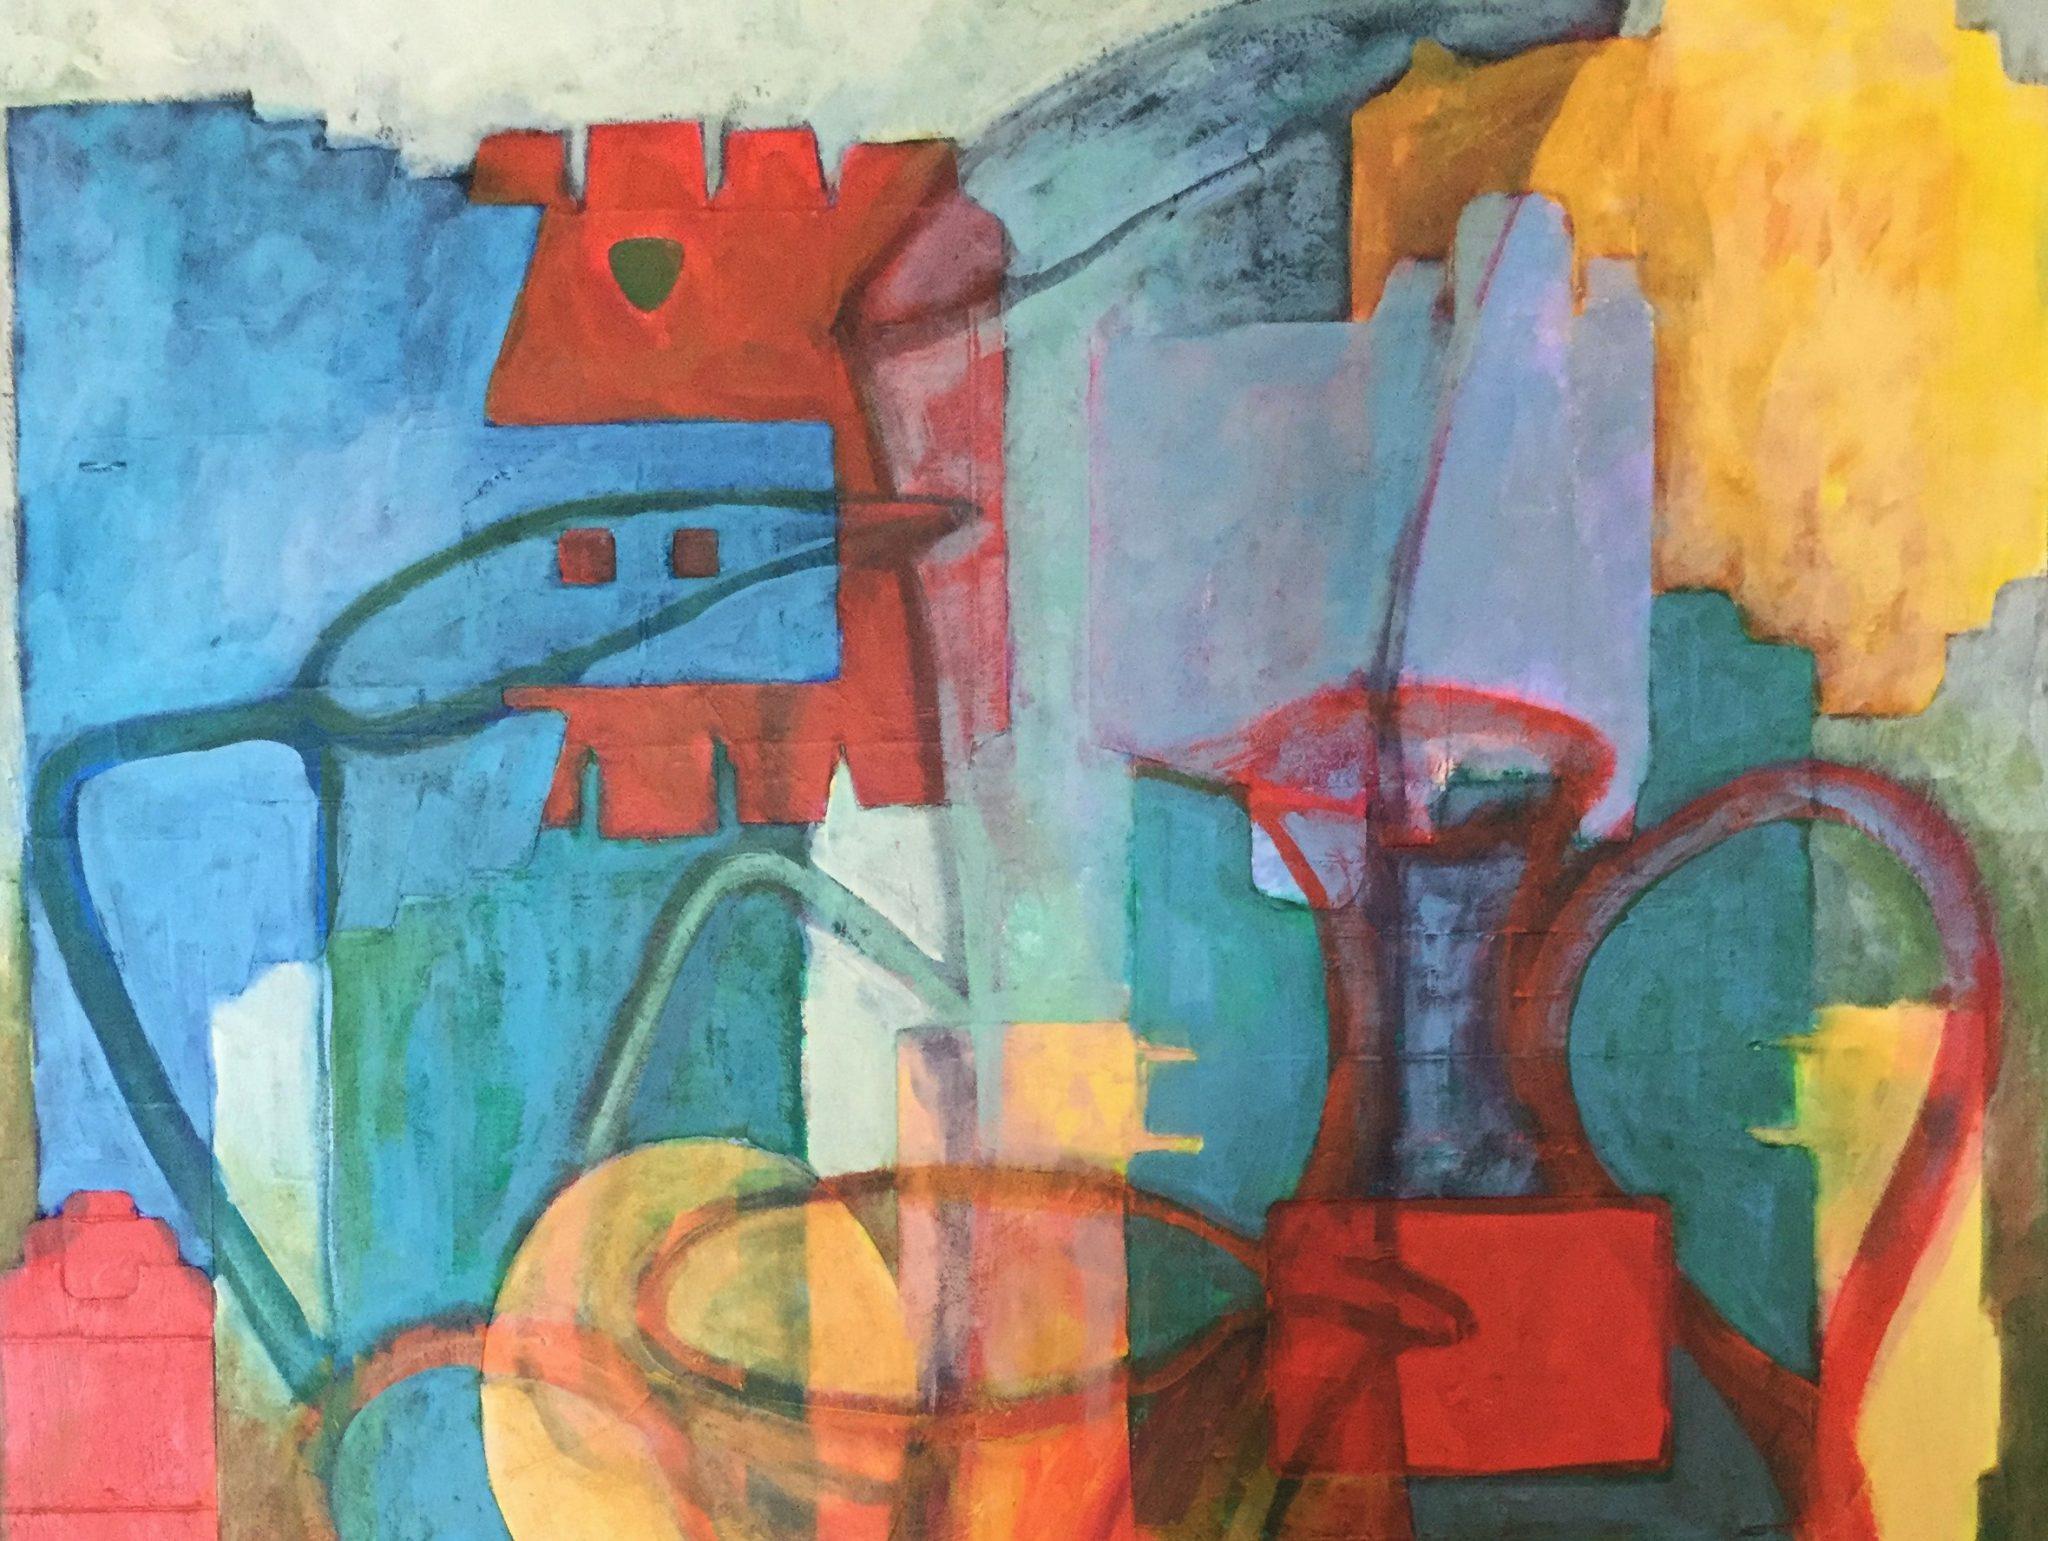 Dani Flowerdew art exhibition at Pie Factory Margate